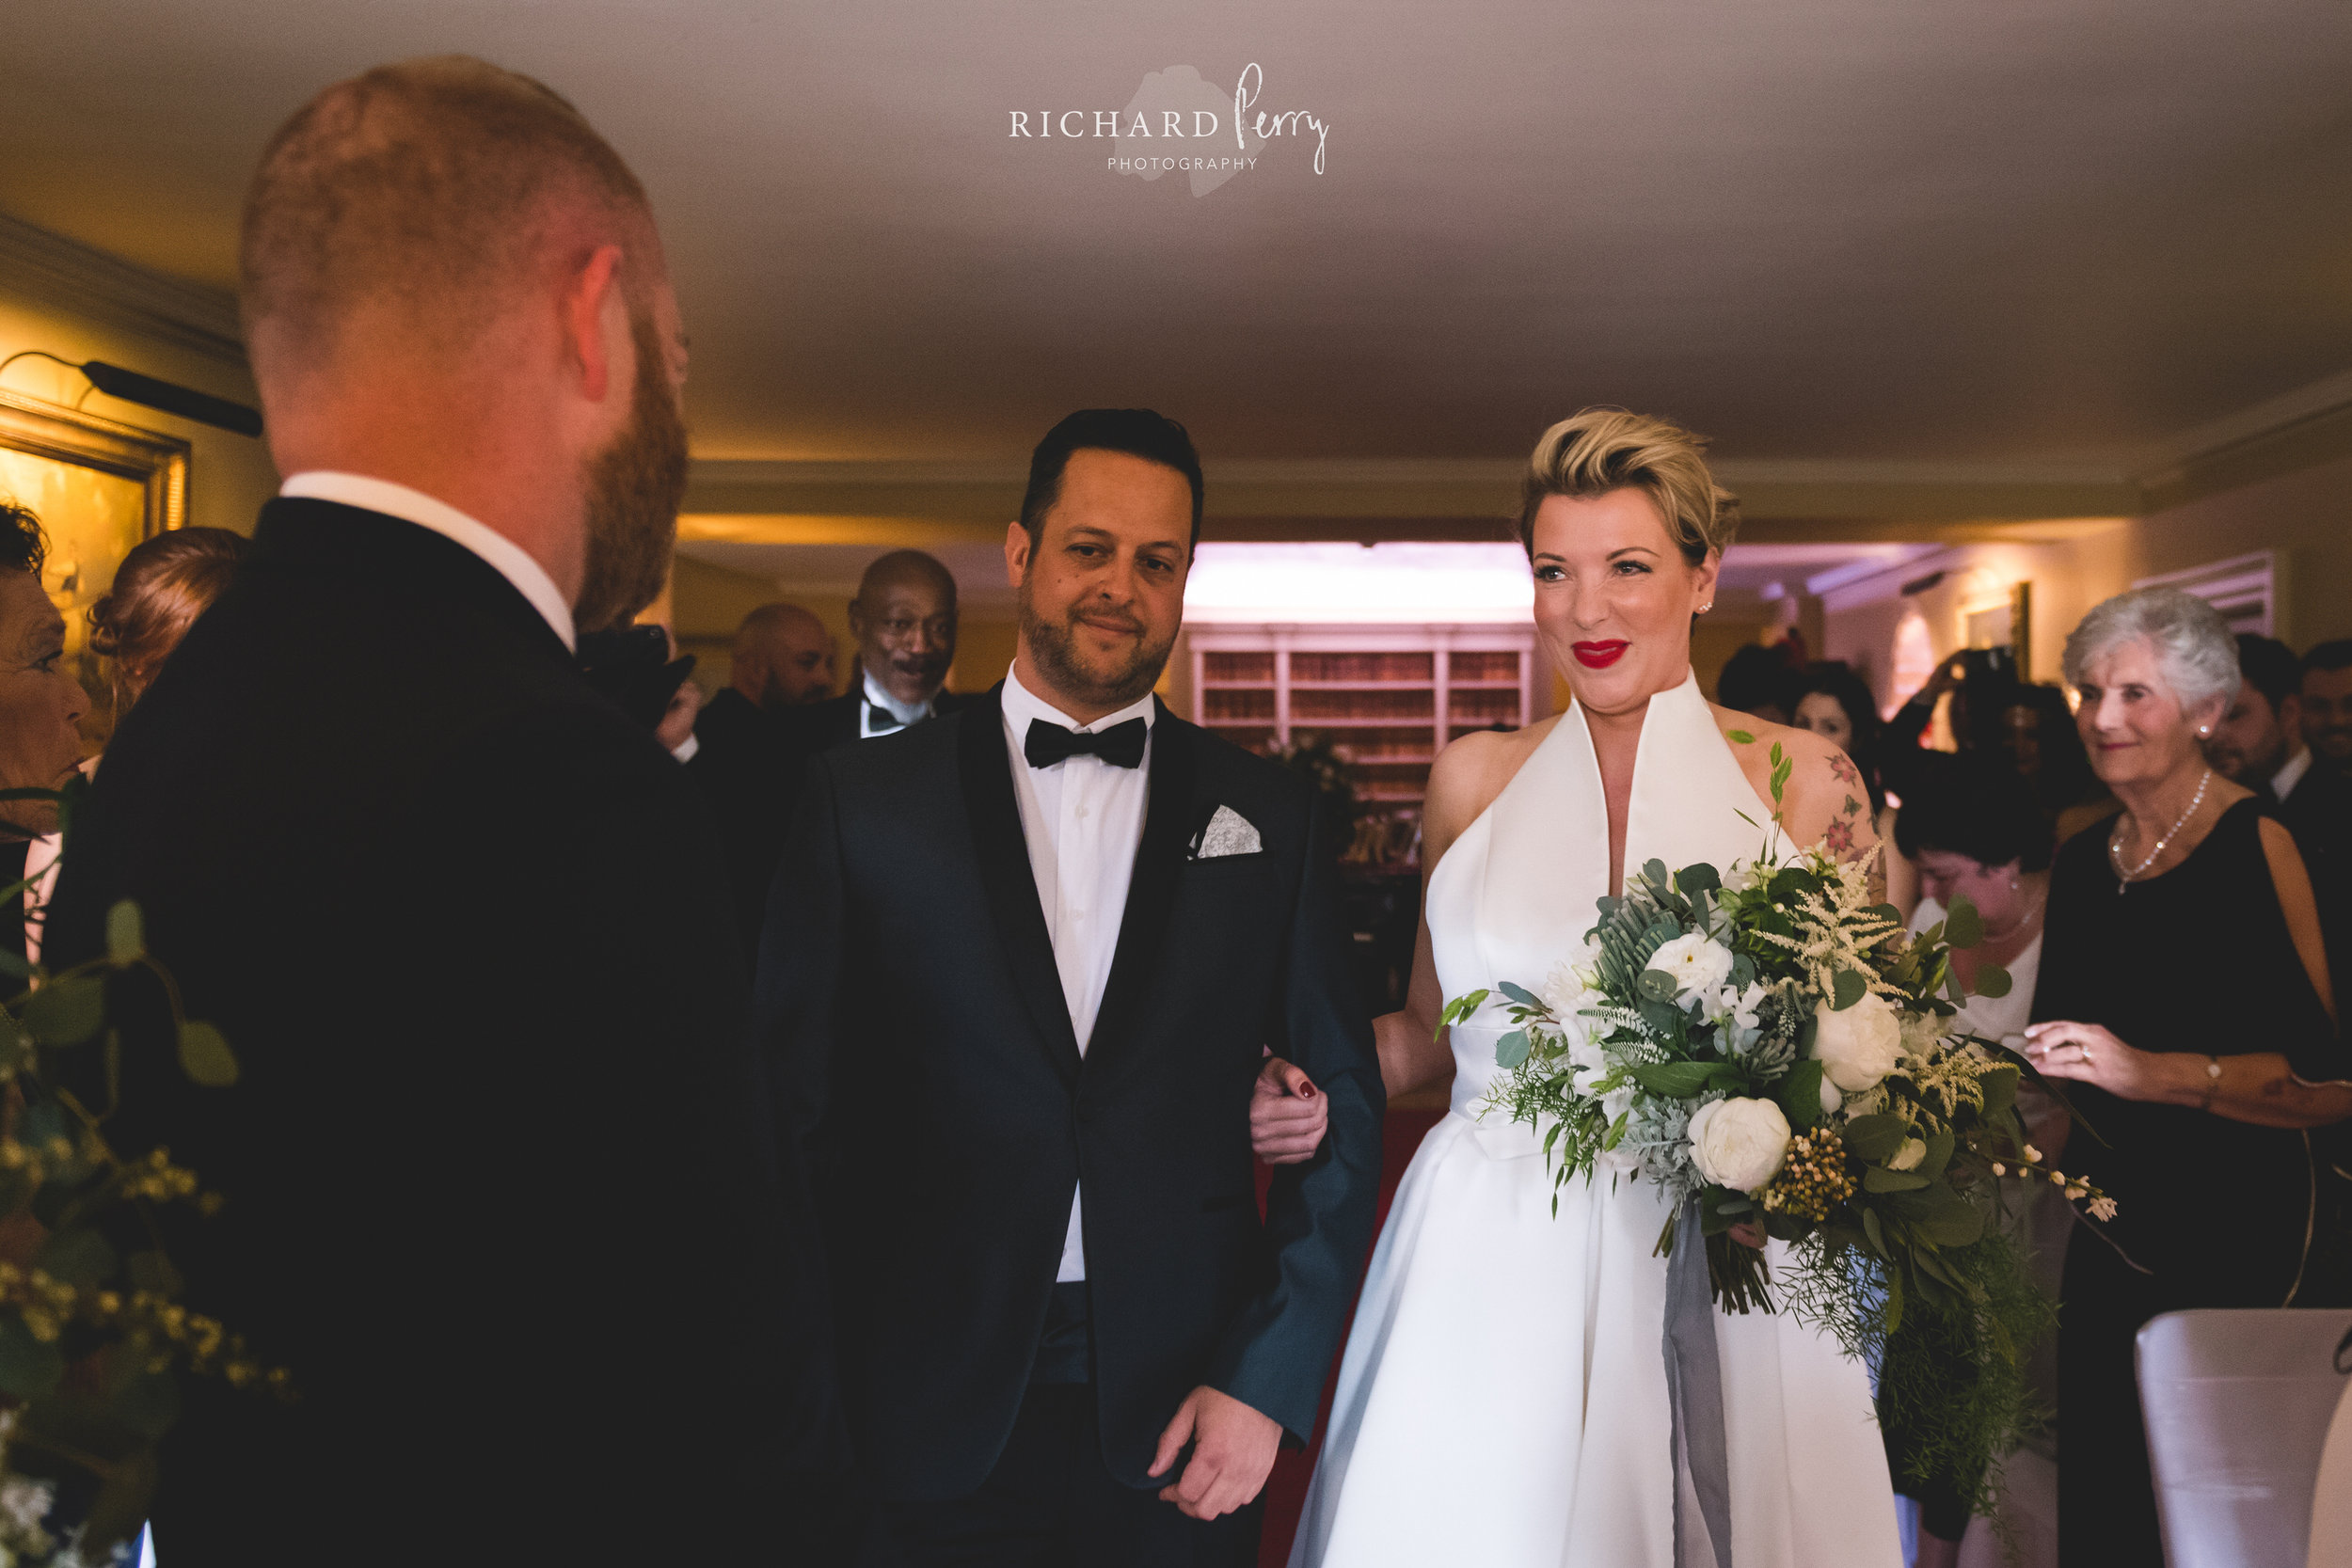 yorkshire-wedding-photographer-destination-archerfield-house-14.jpg